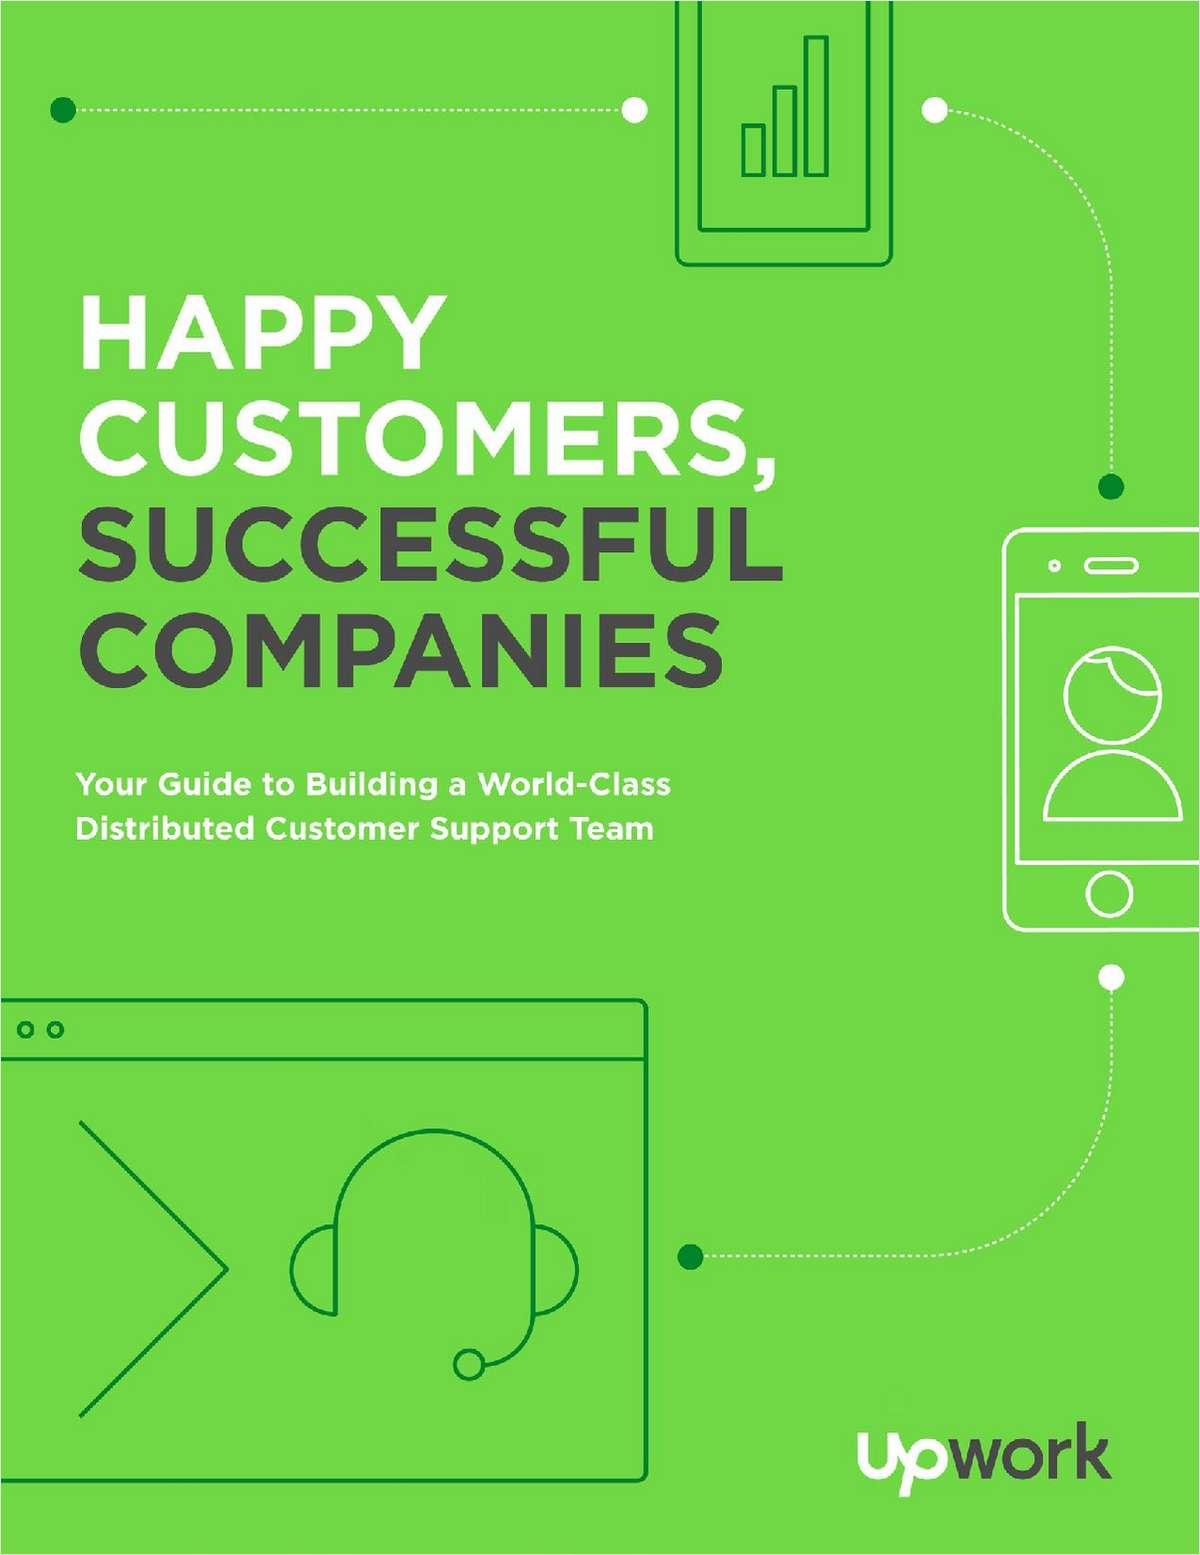 Happy Customers, Successful Companies